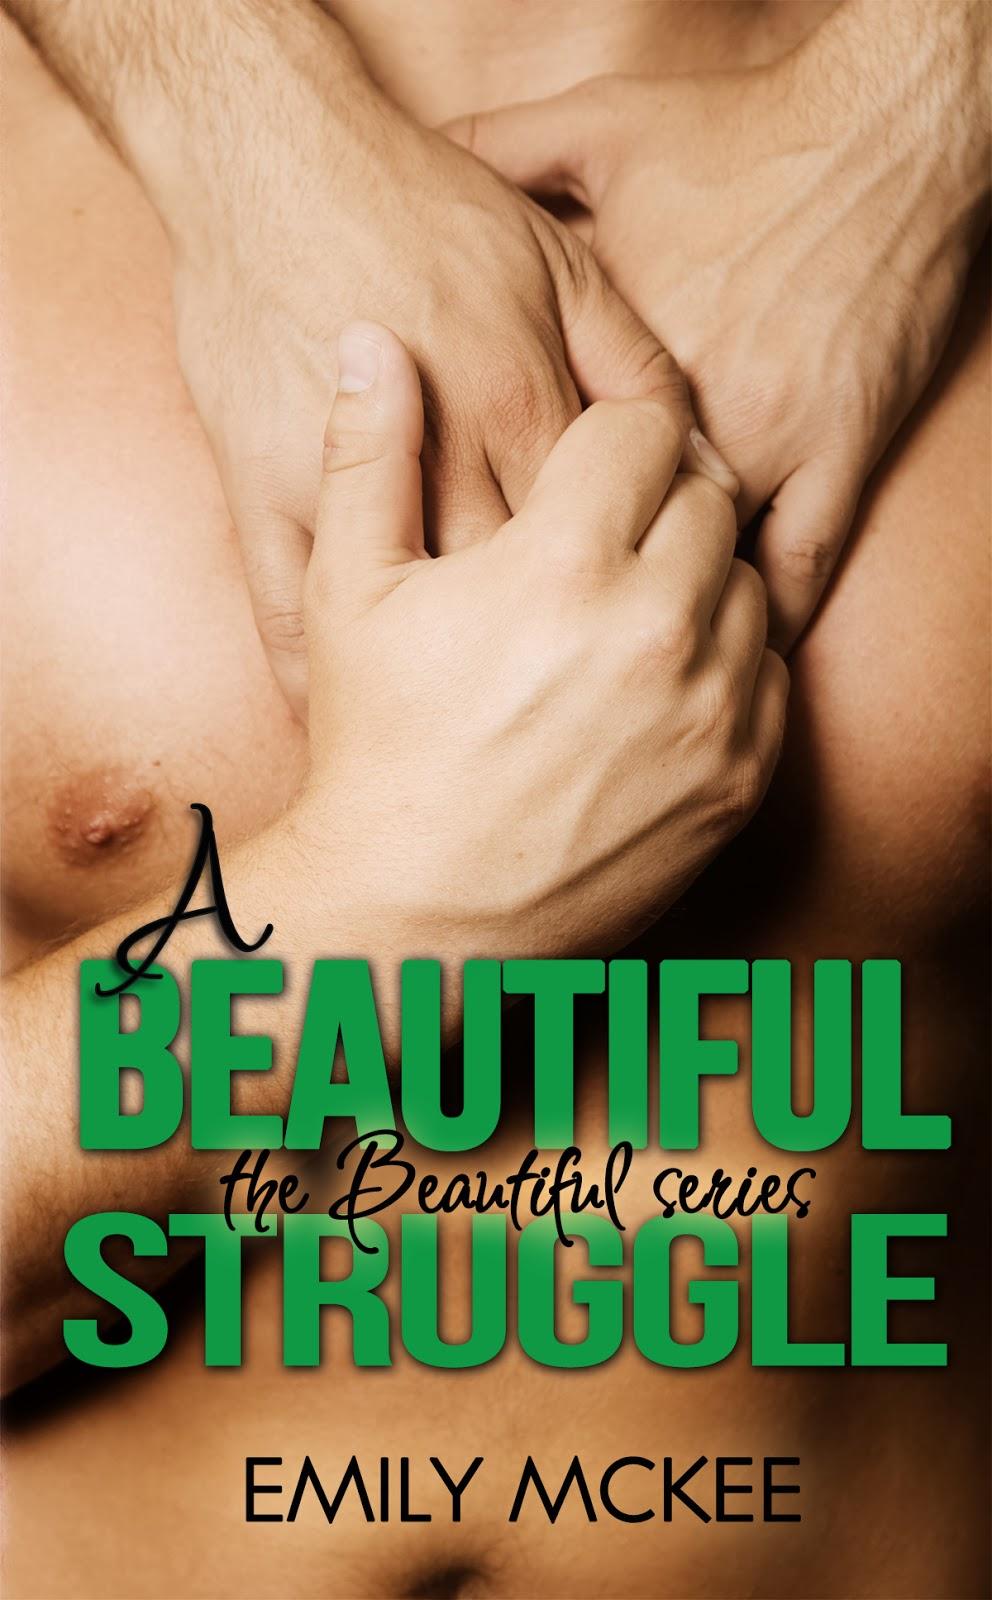 https://www.goodreads.com/book/show/18074049-a-beautiful-struggle